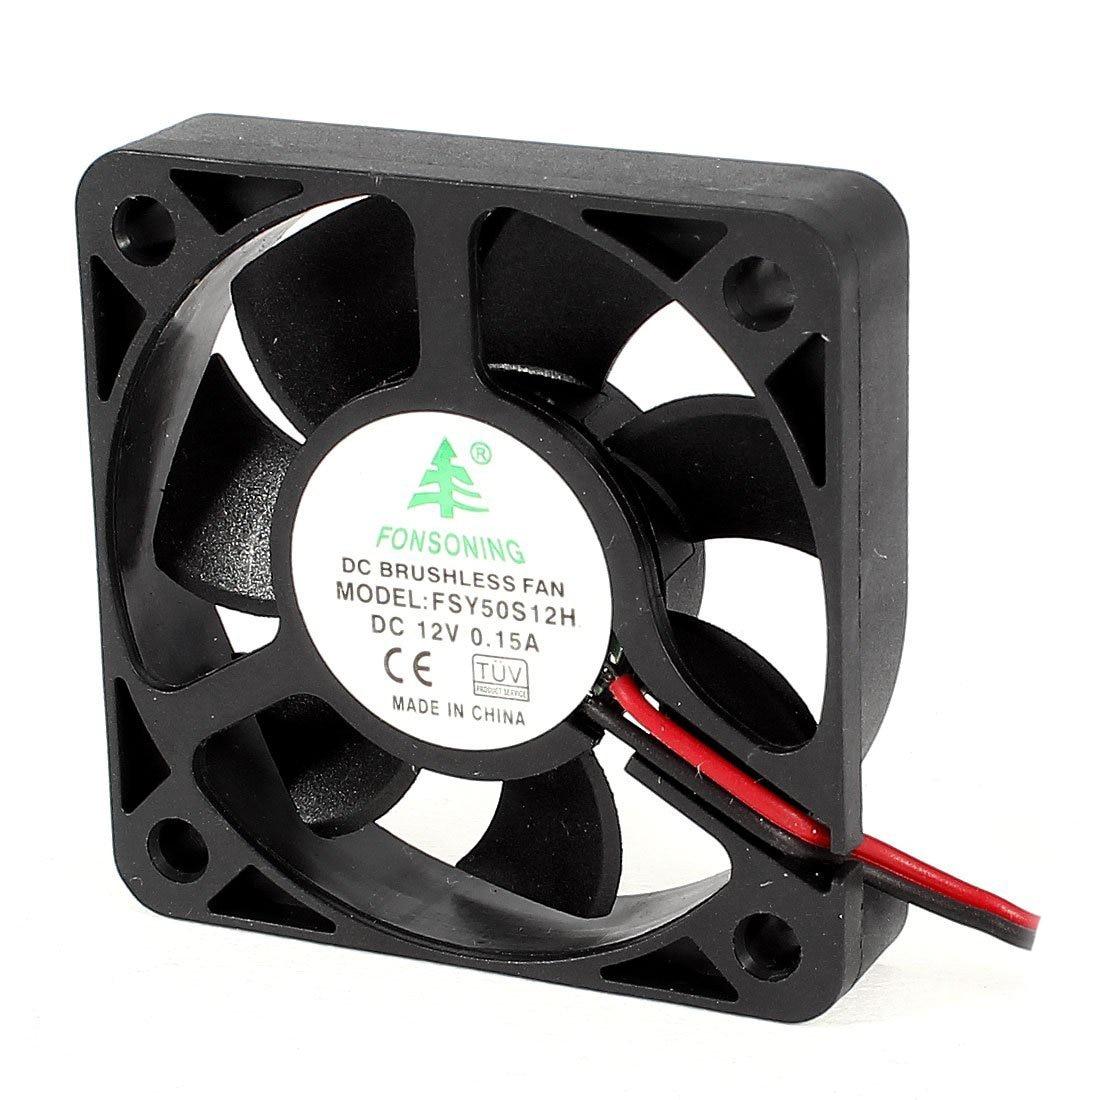 Подробнее о FSY50S12H 50mm x 10mm 2Pin 12V DC Brushless PC Case Cooling Fan измерительный прибор fsy